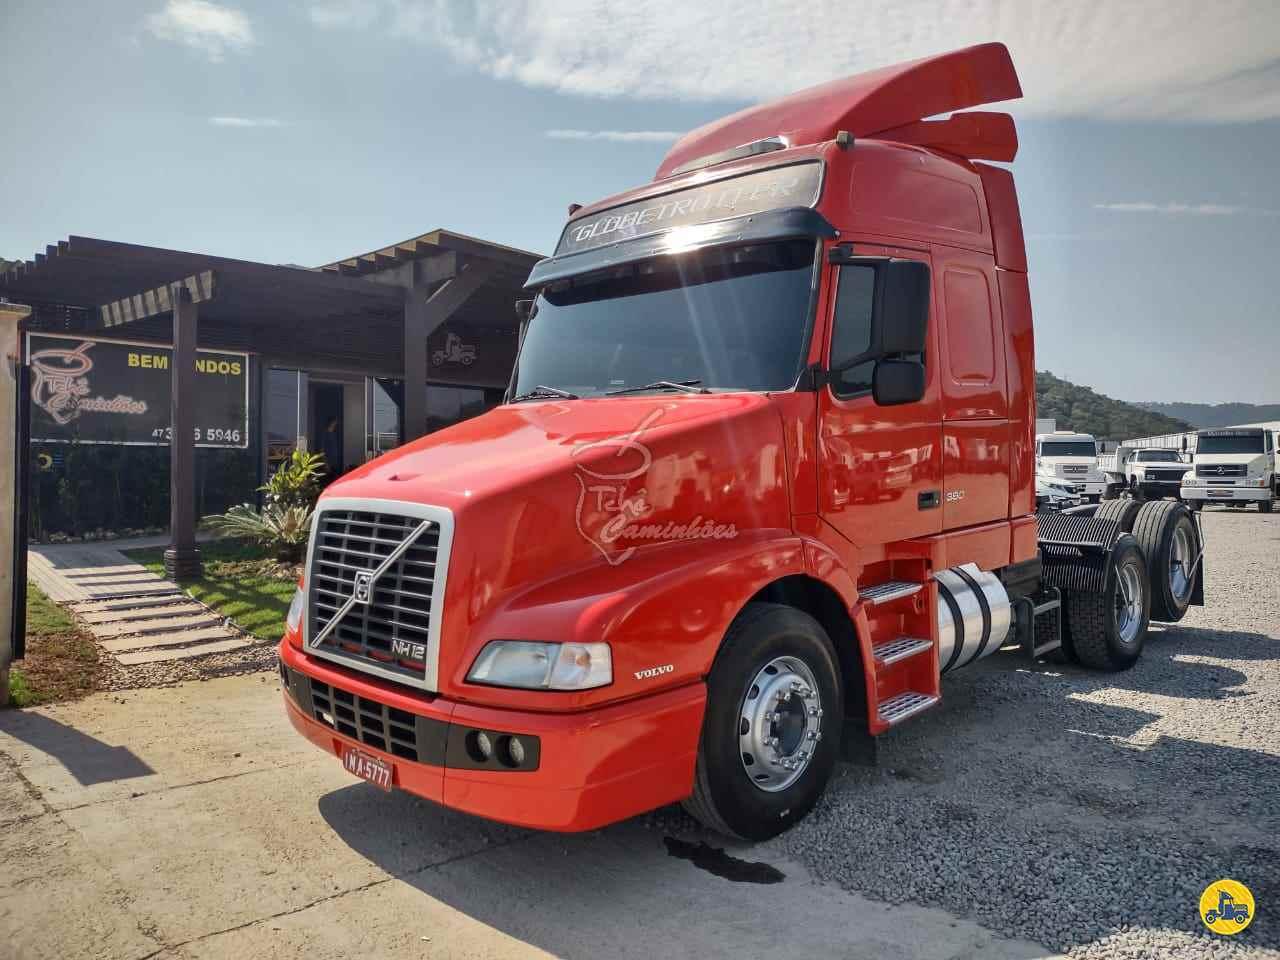 CAMINHAO VOLVO VOLVO NH12 380 Cavalo Mecânico Truck 6x2 Tchê Caminhões ITAJAI SANTA CATARINA SC